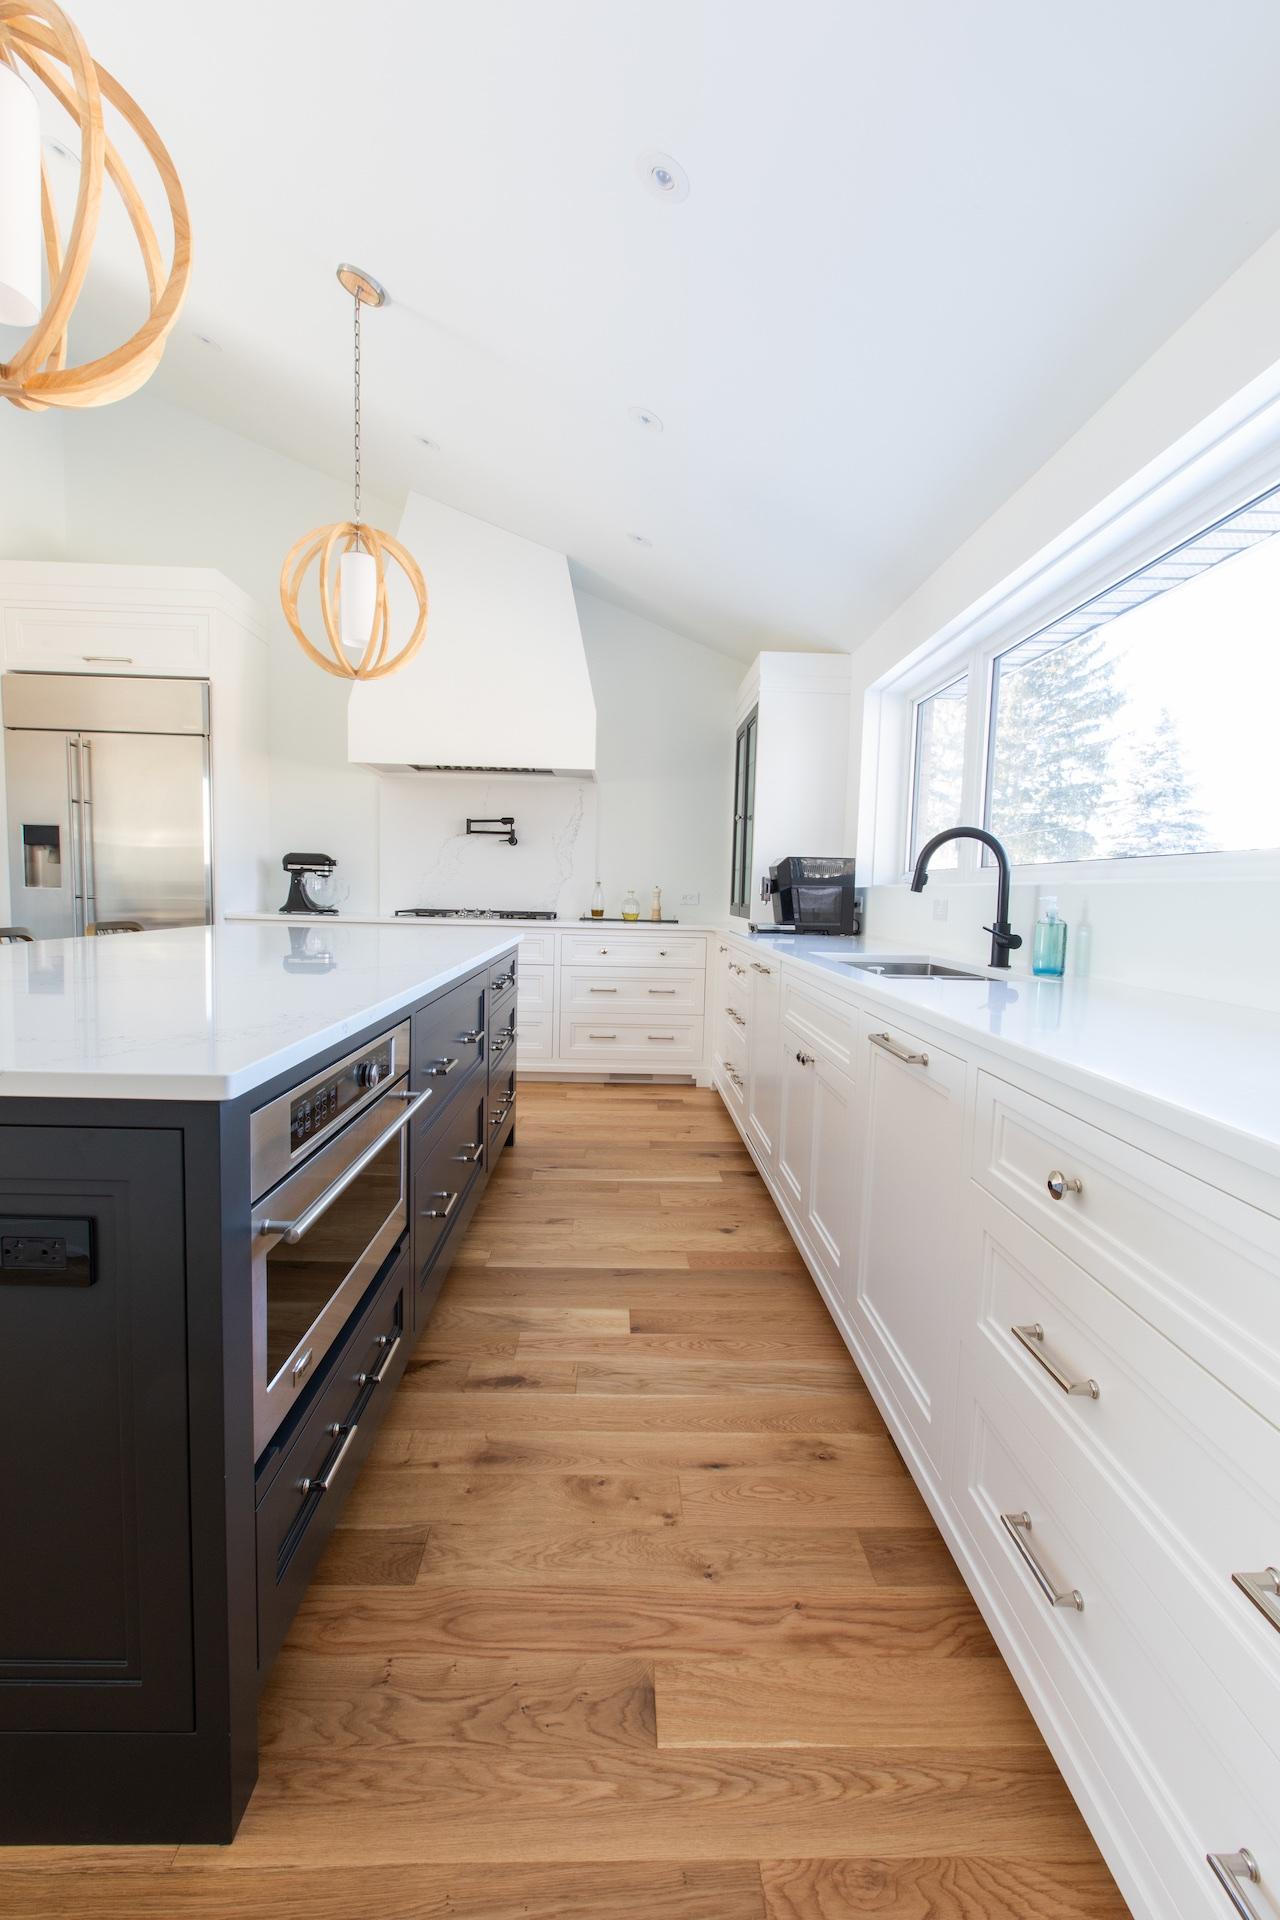 Wood floor, white cabinets blue island